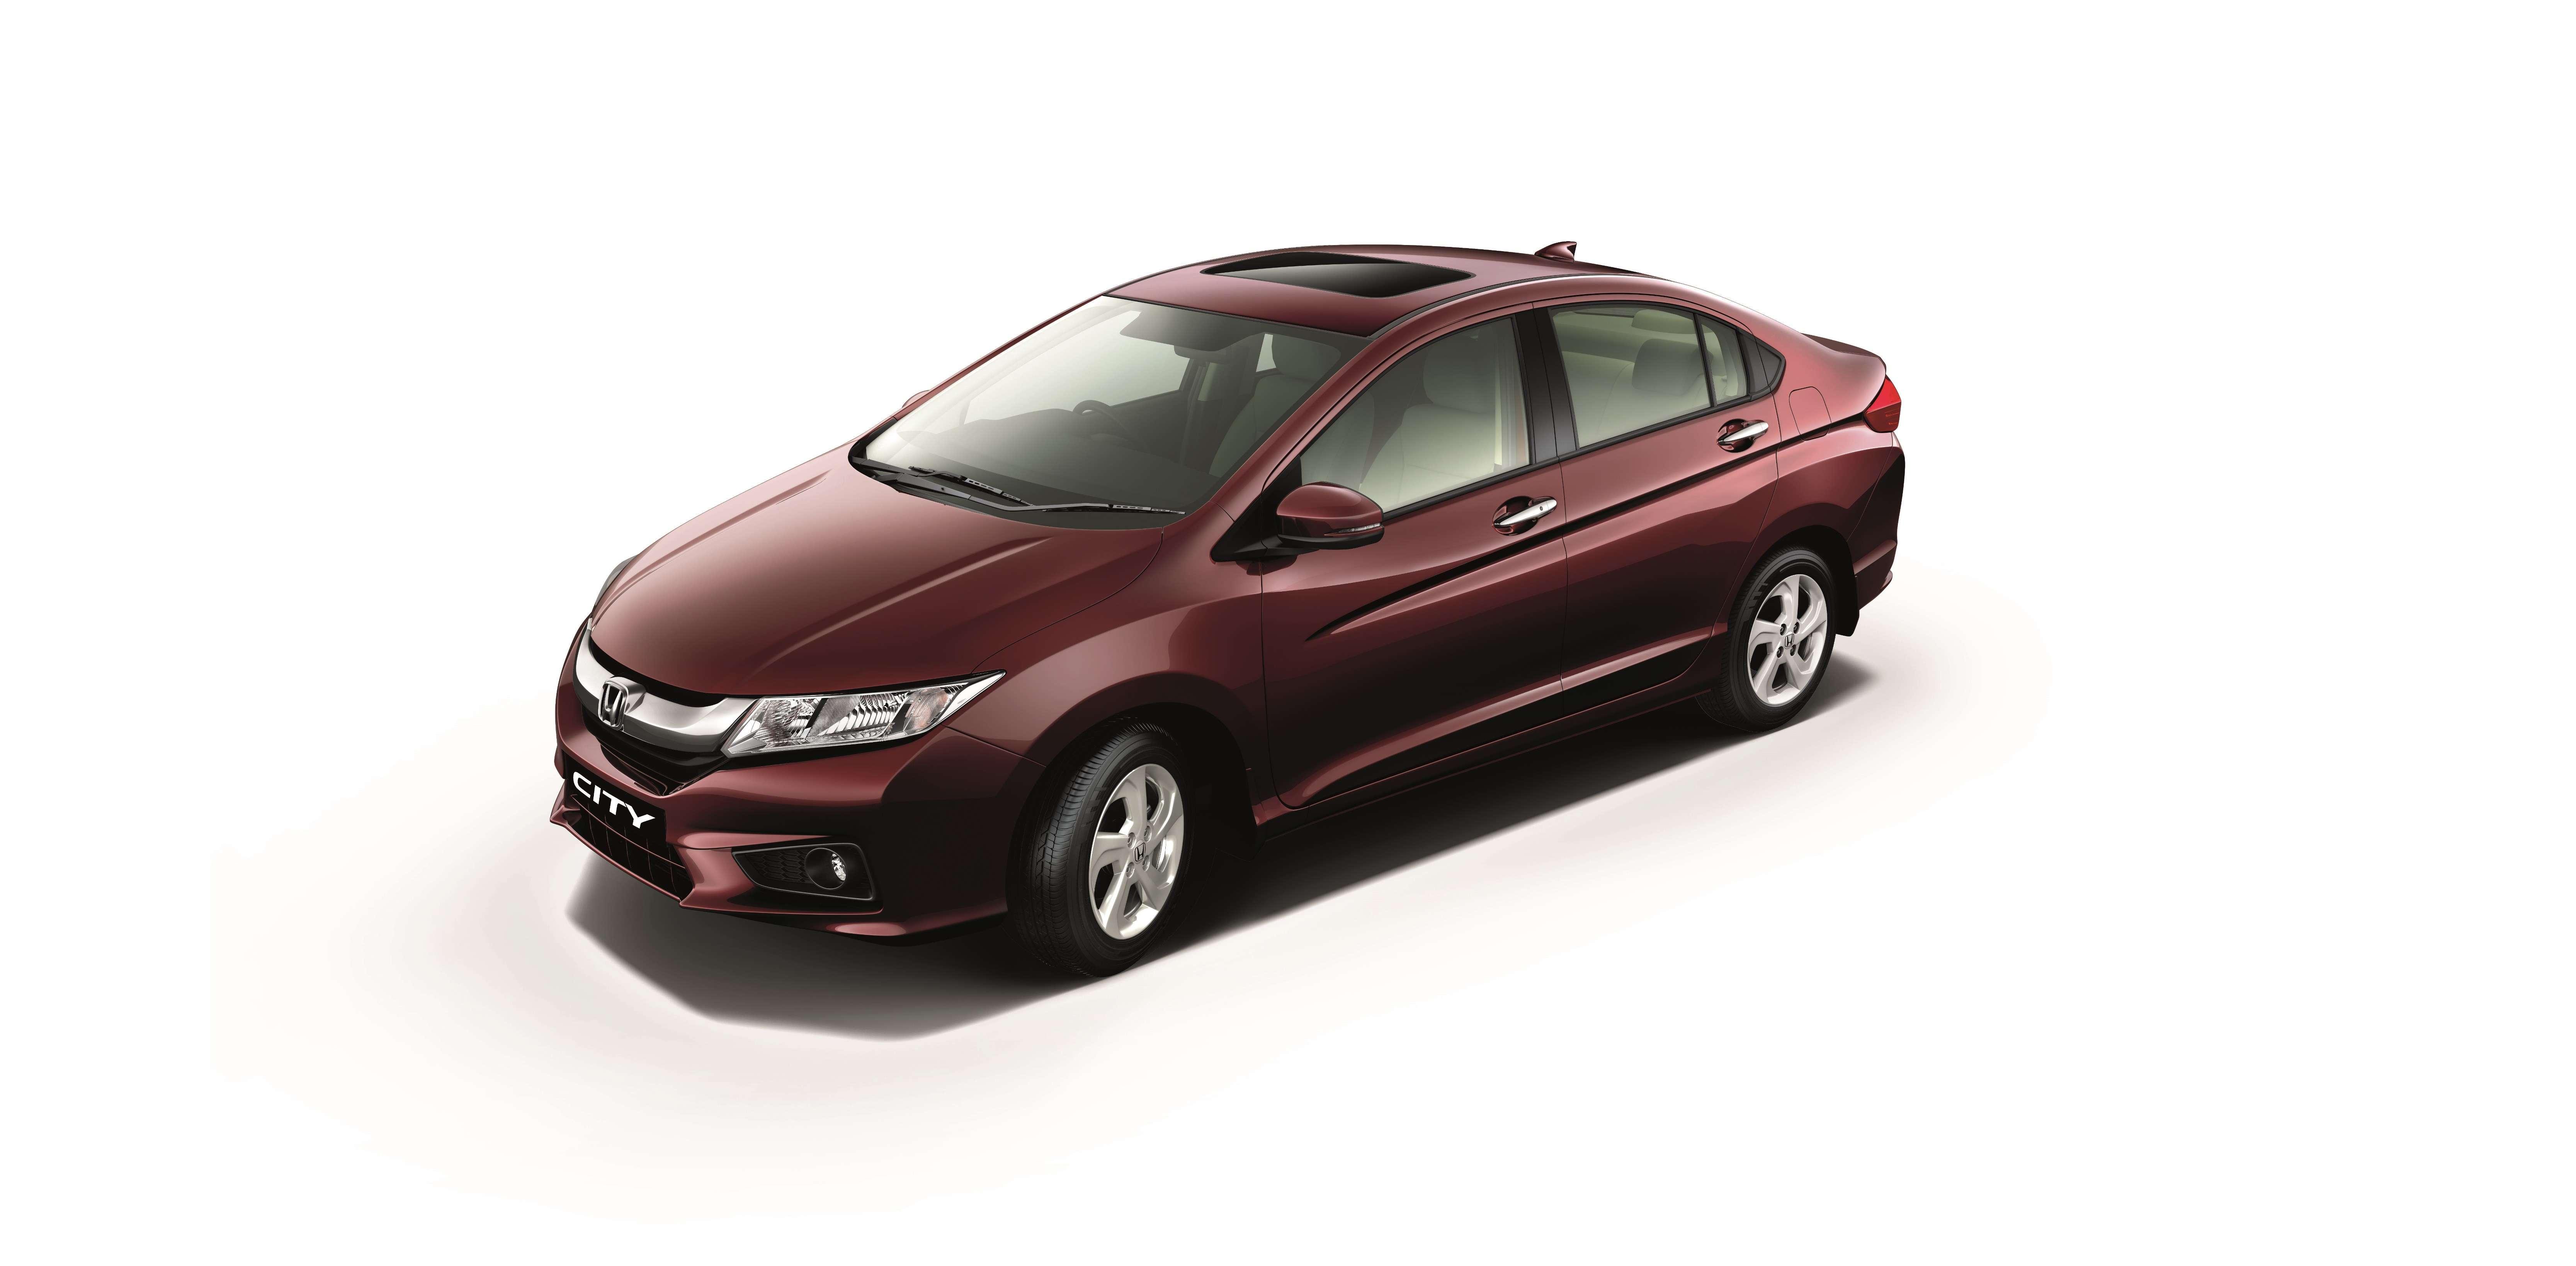 Zx Mt Honda City Honda Cars Introduces Zx Mt City Variant Priced At